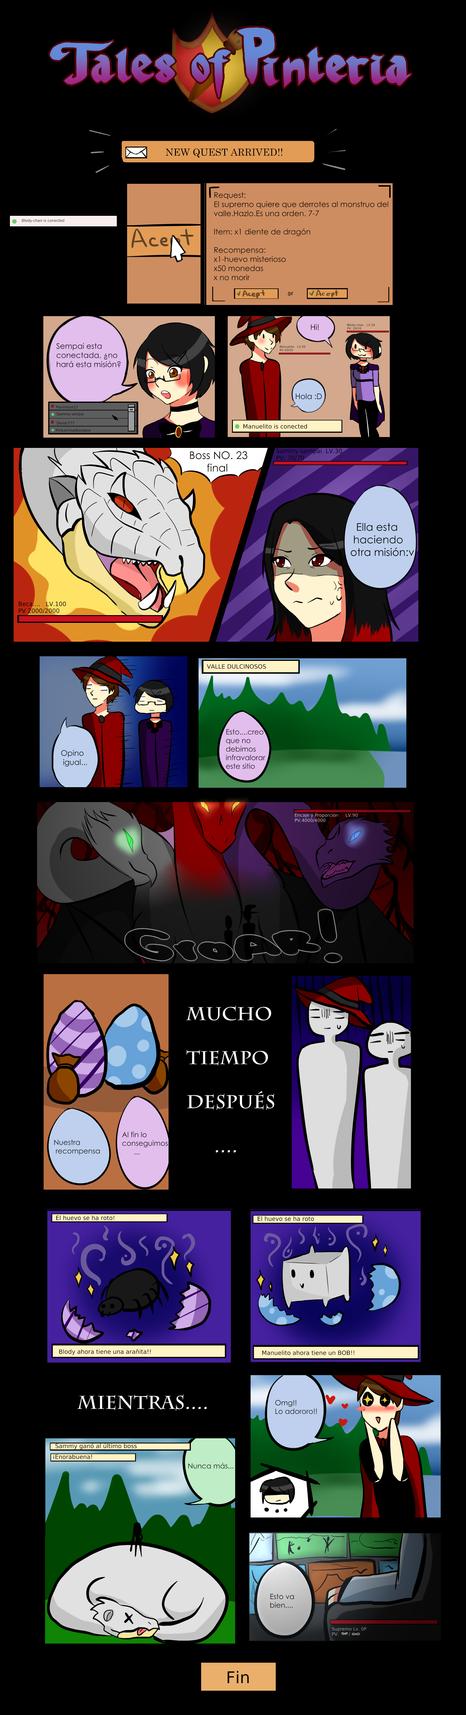 tails of pinteria #1 (spanish) by ultra-bloodbath